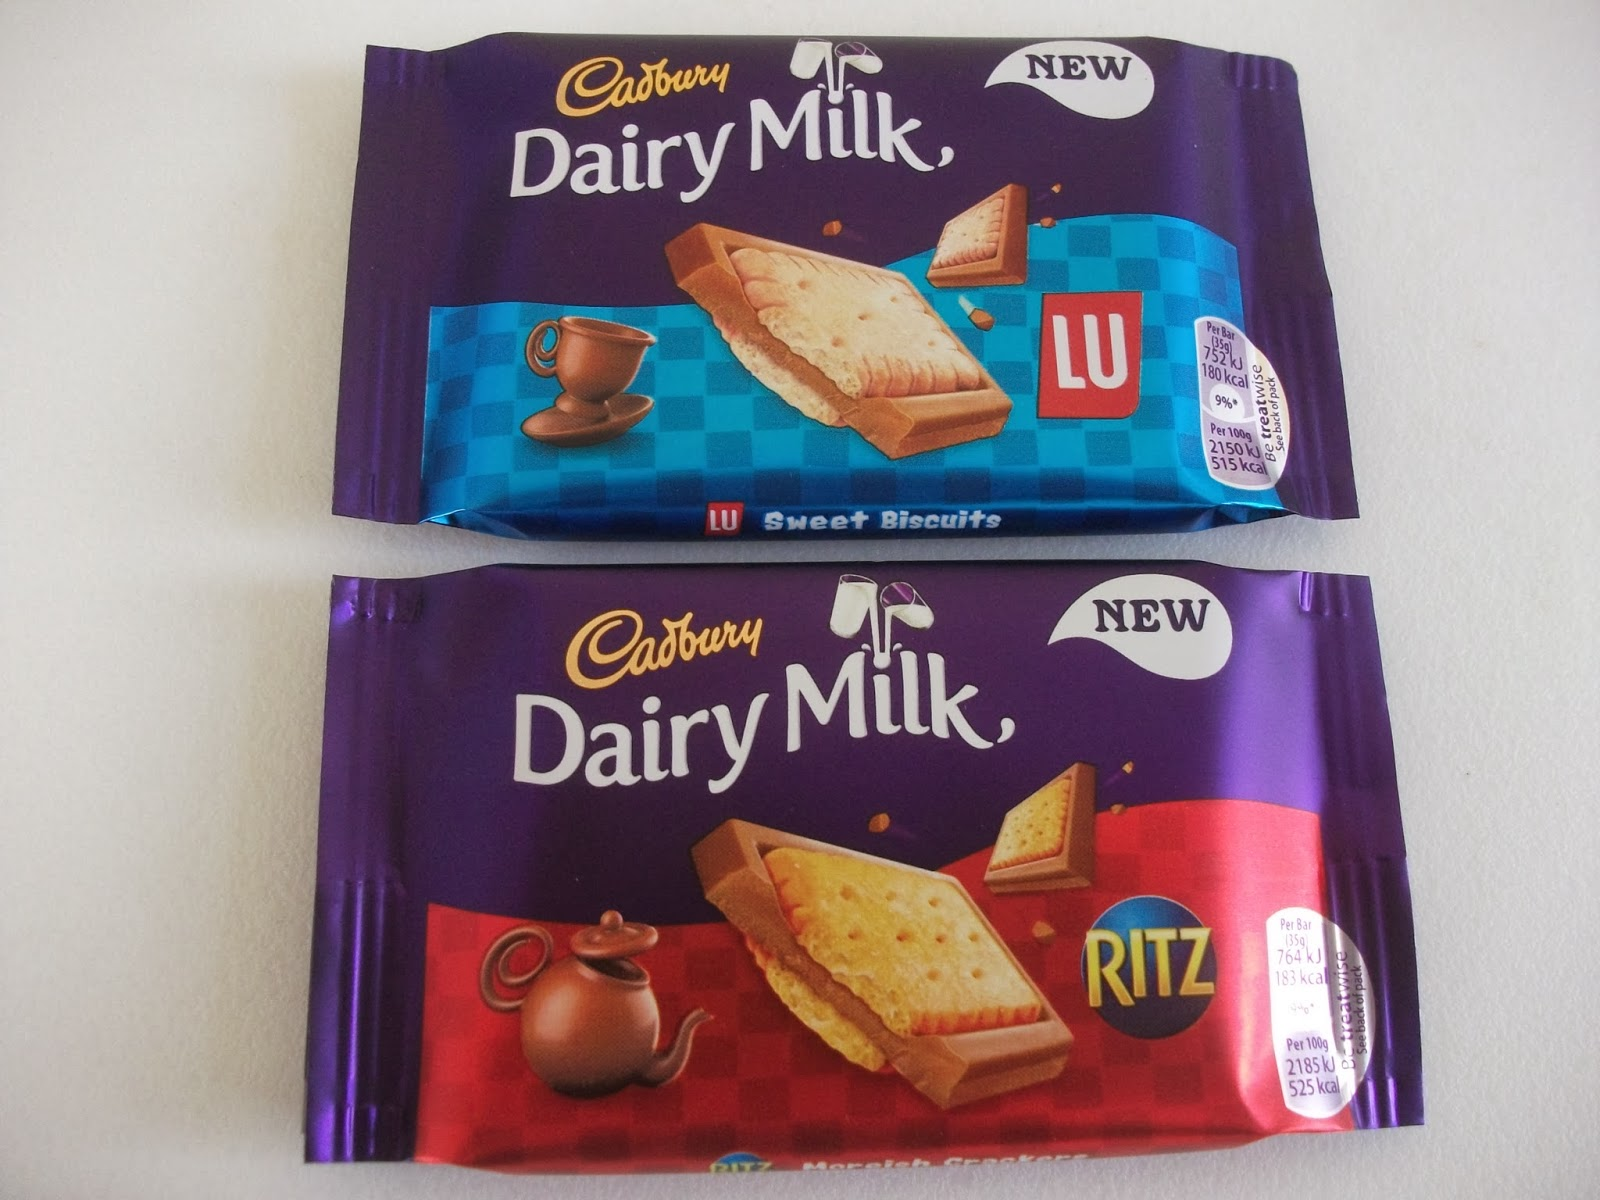 cadbury dairy milk with ritz crackers and lu sweet biscuits